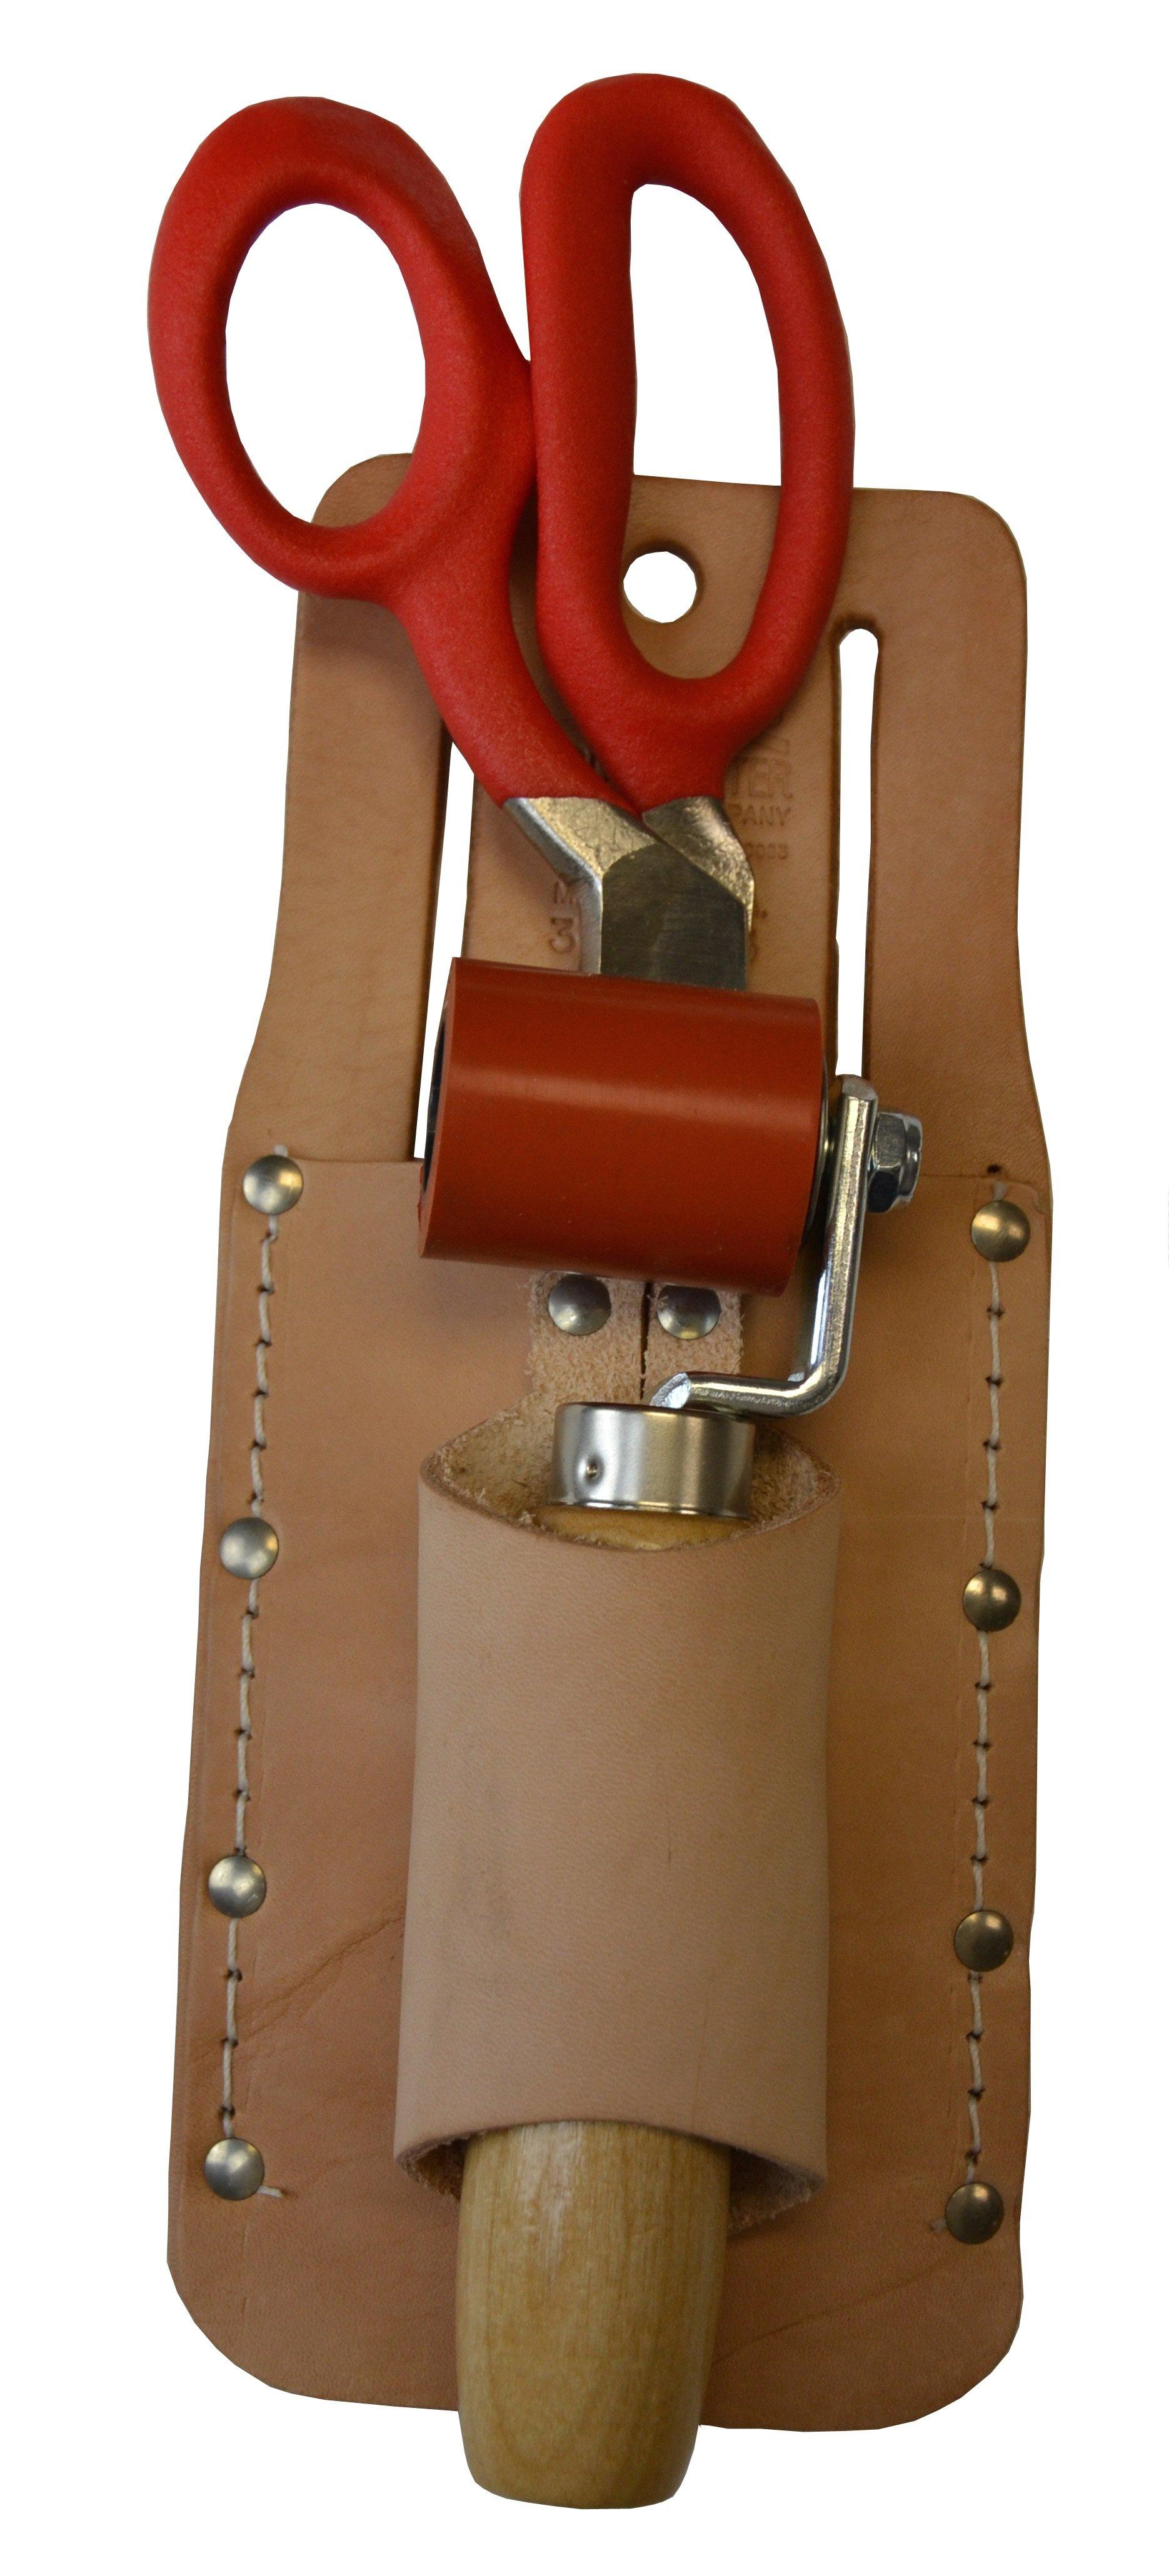 tool sheath